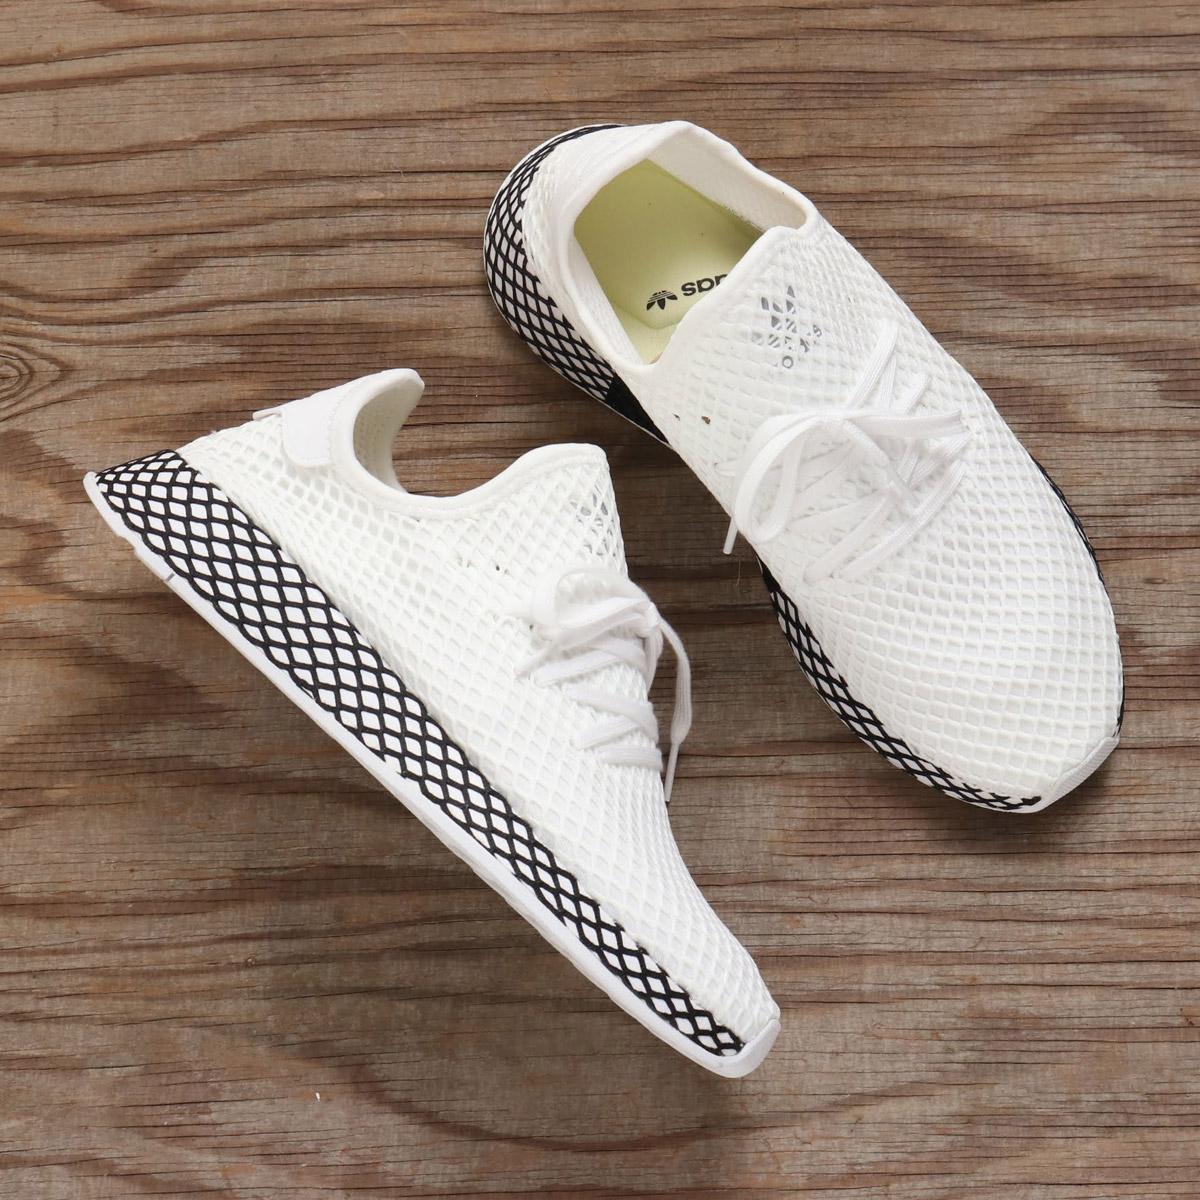 e7fc9d68d adidas Originals DEERUPT RUNNER (アディダスオリジナルスディラプトランナー) RUNNING WHITE RUNNING  WHITE CORE BLACK 18FA-I